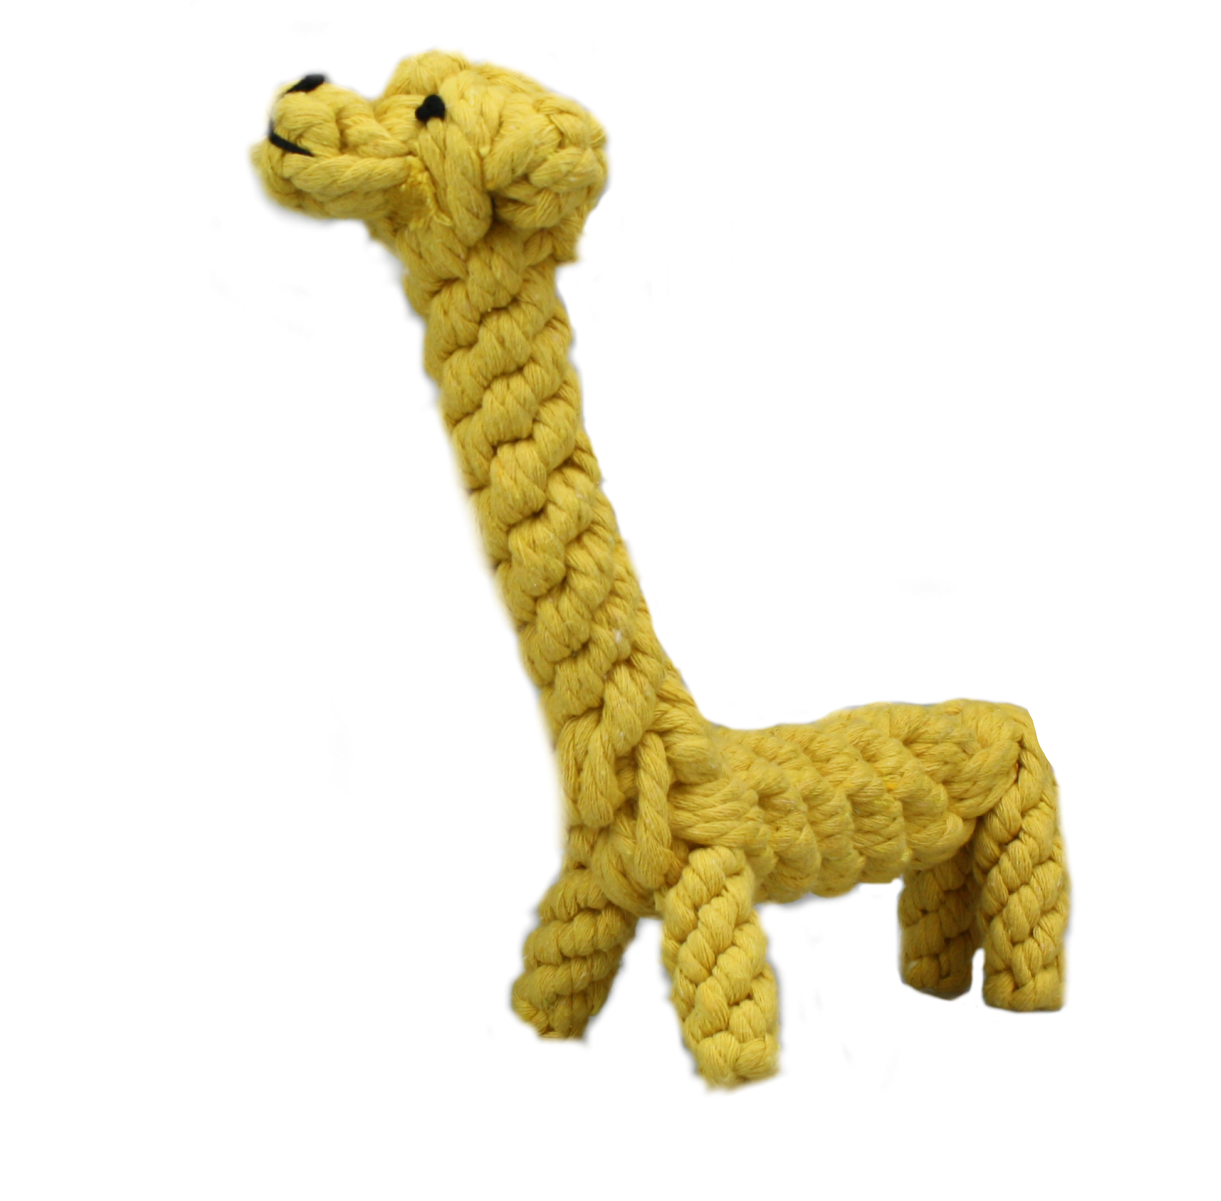 Hundespielzeug Giraffe